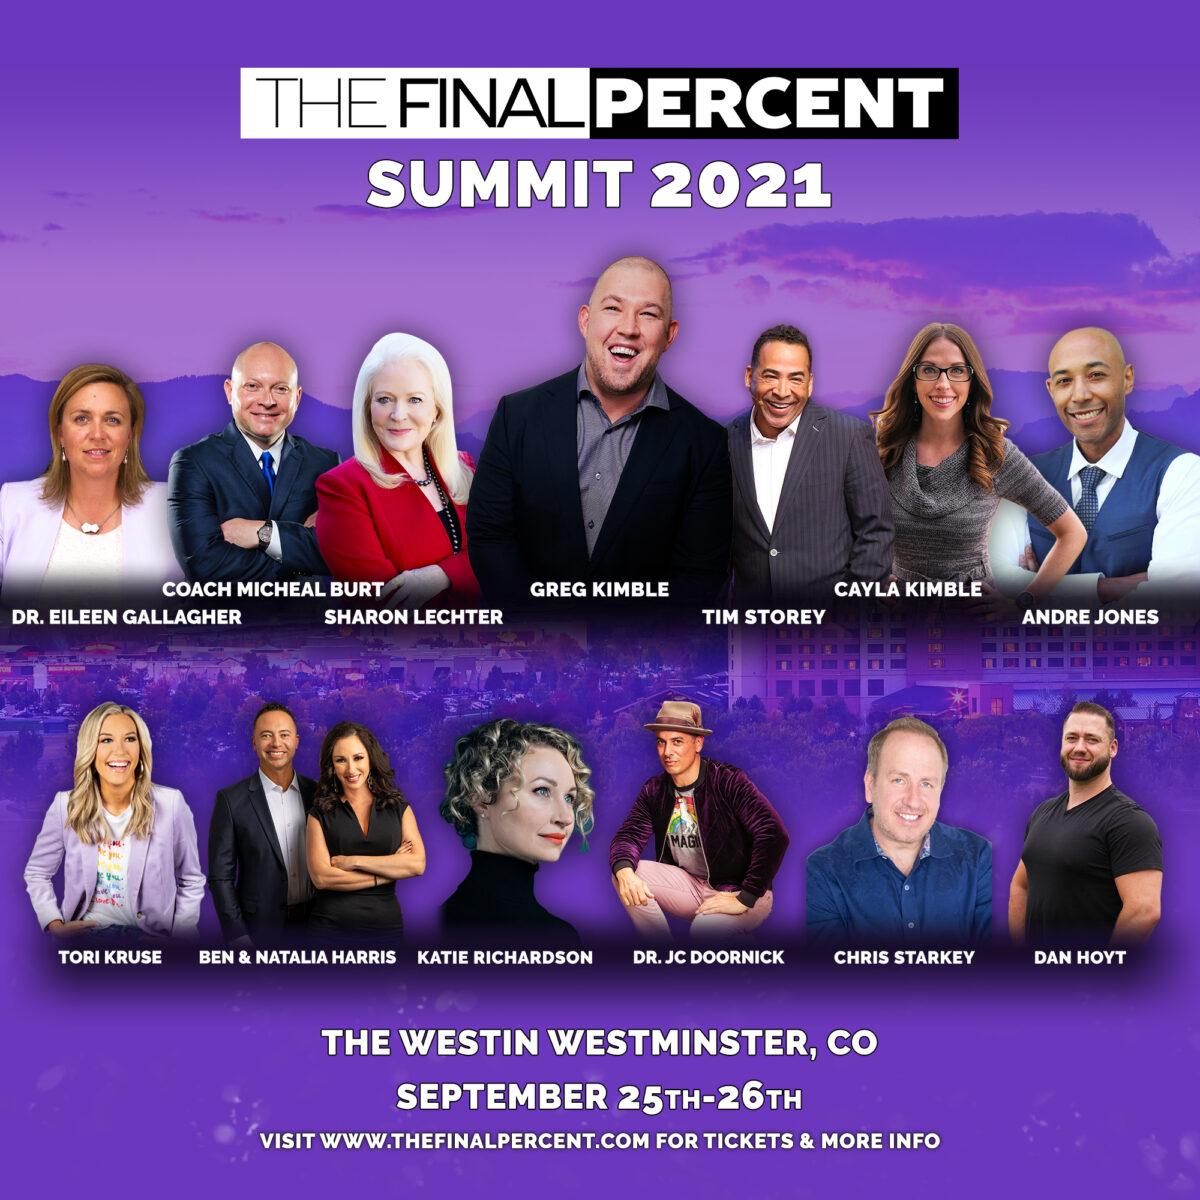 The Final Percent